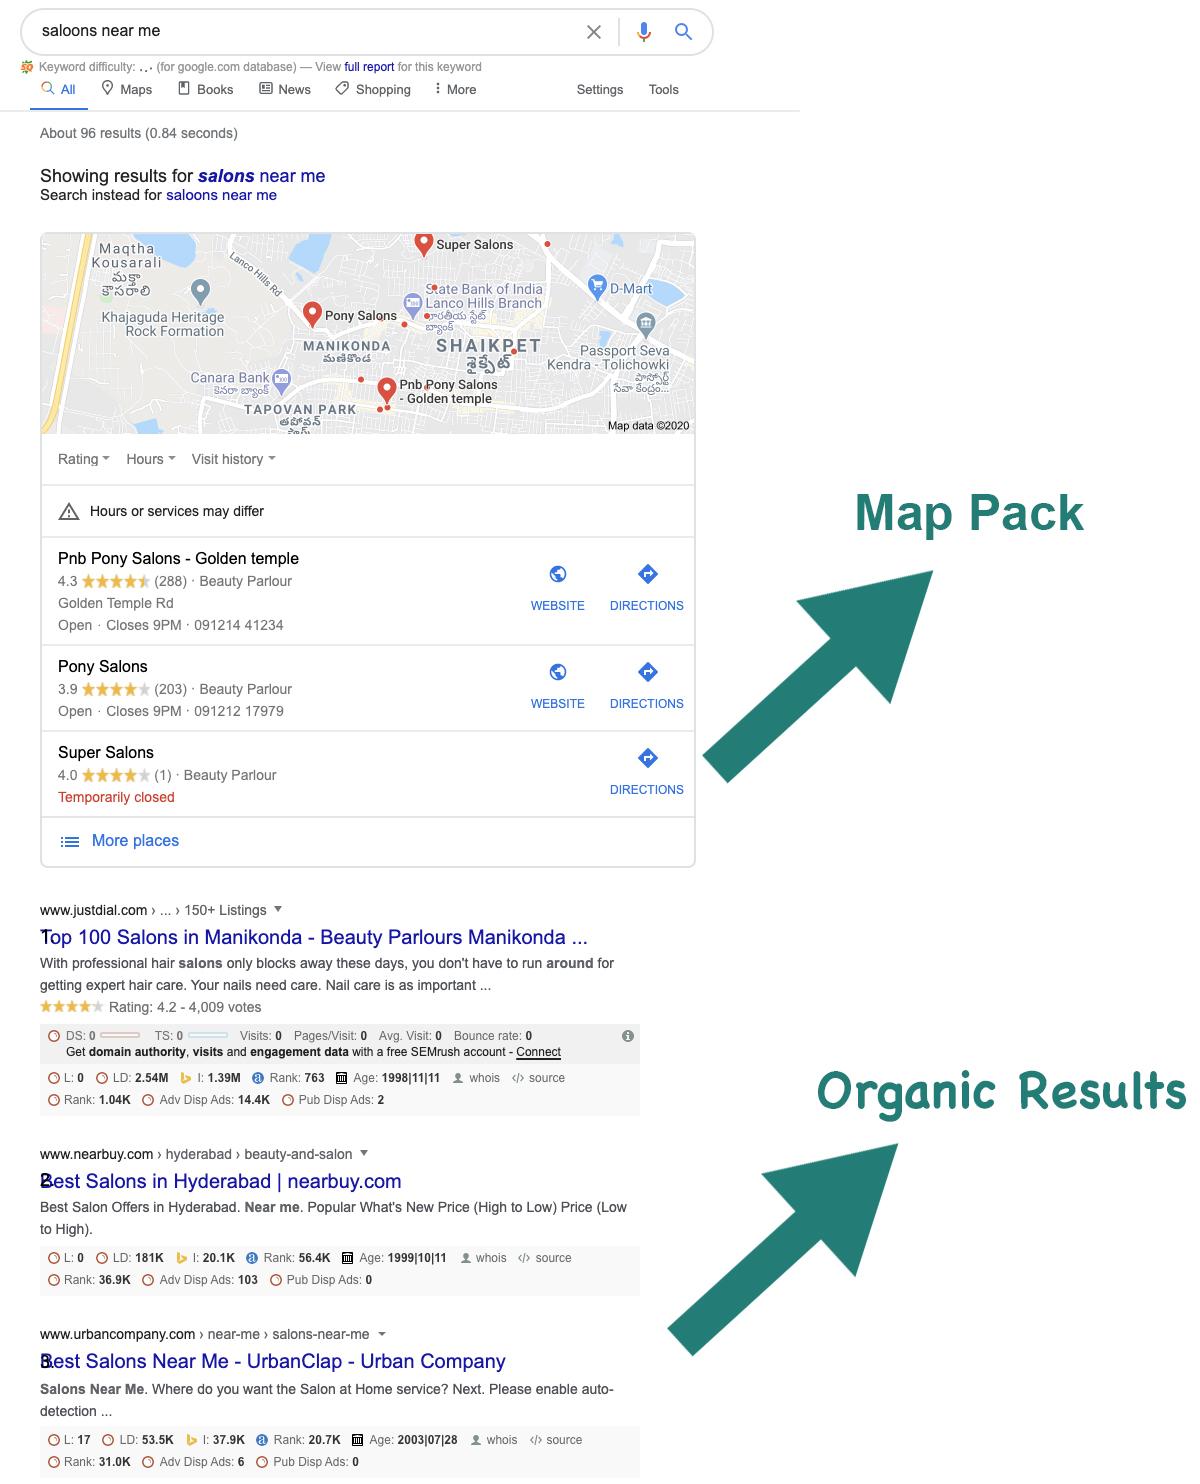 Map pack vs Organic